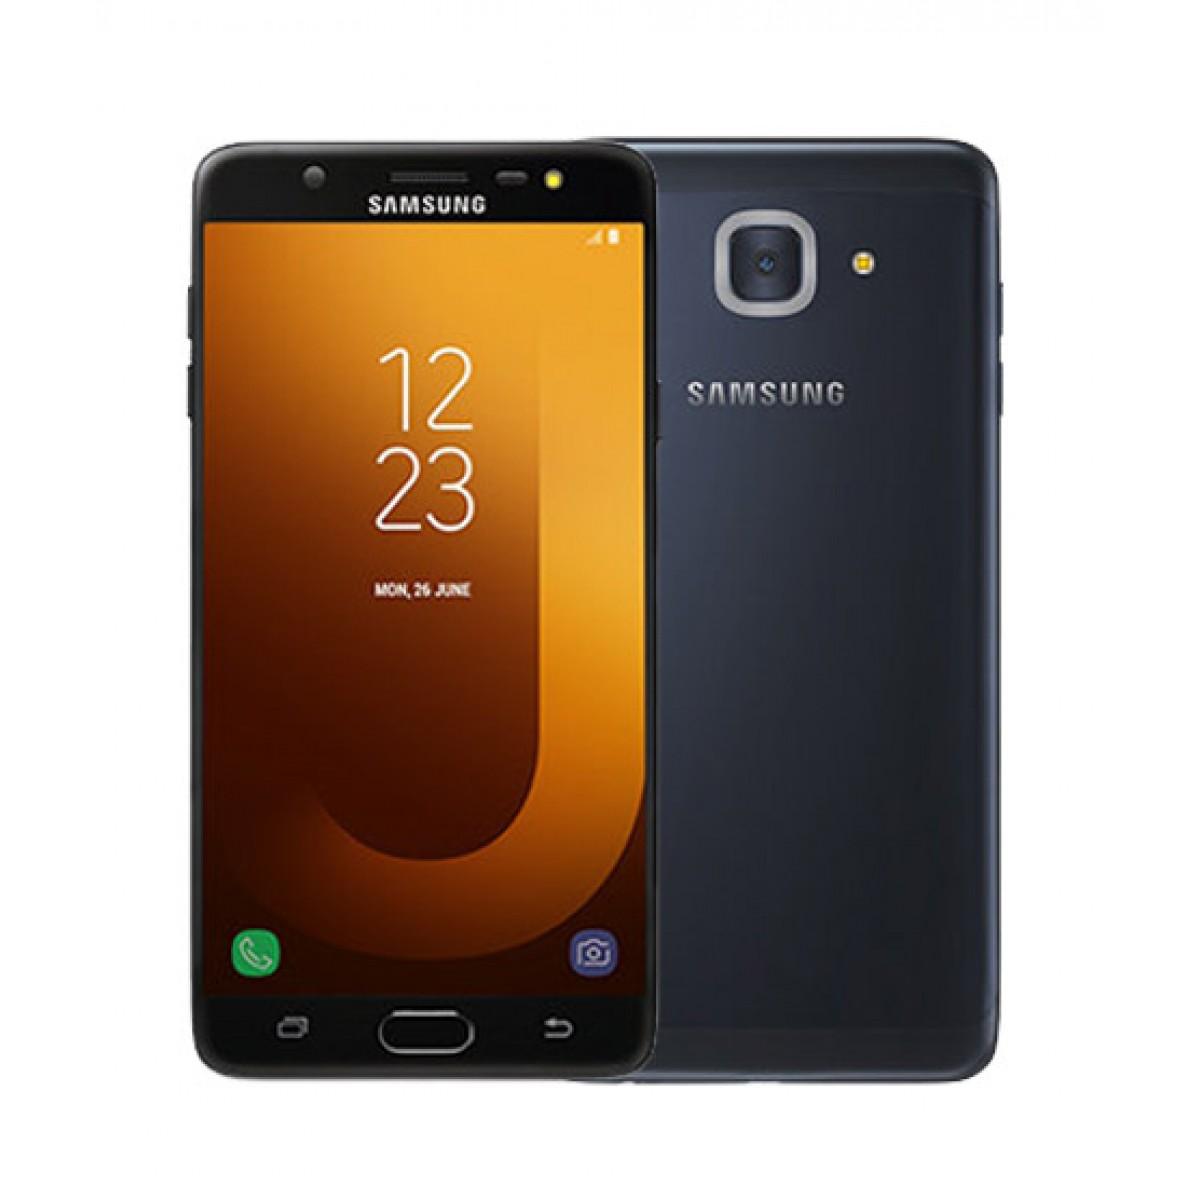 Samsung Galaxy J7 Max (4 GB/32 GB)